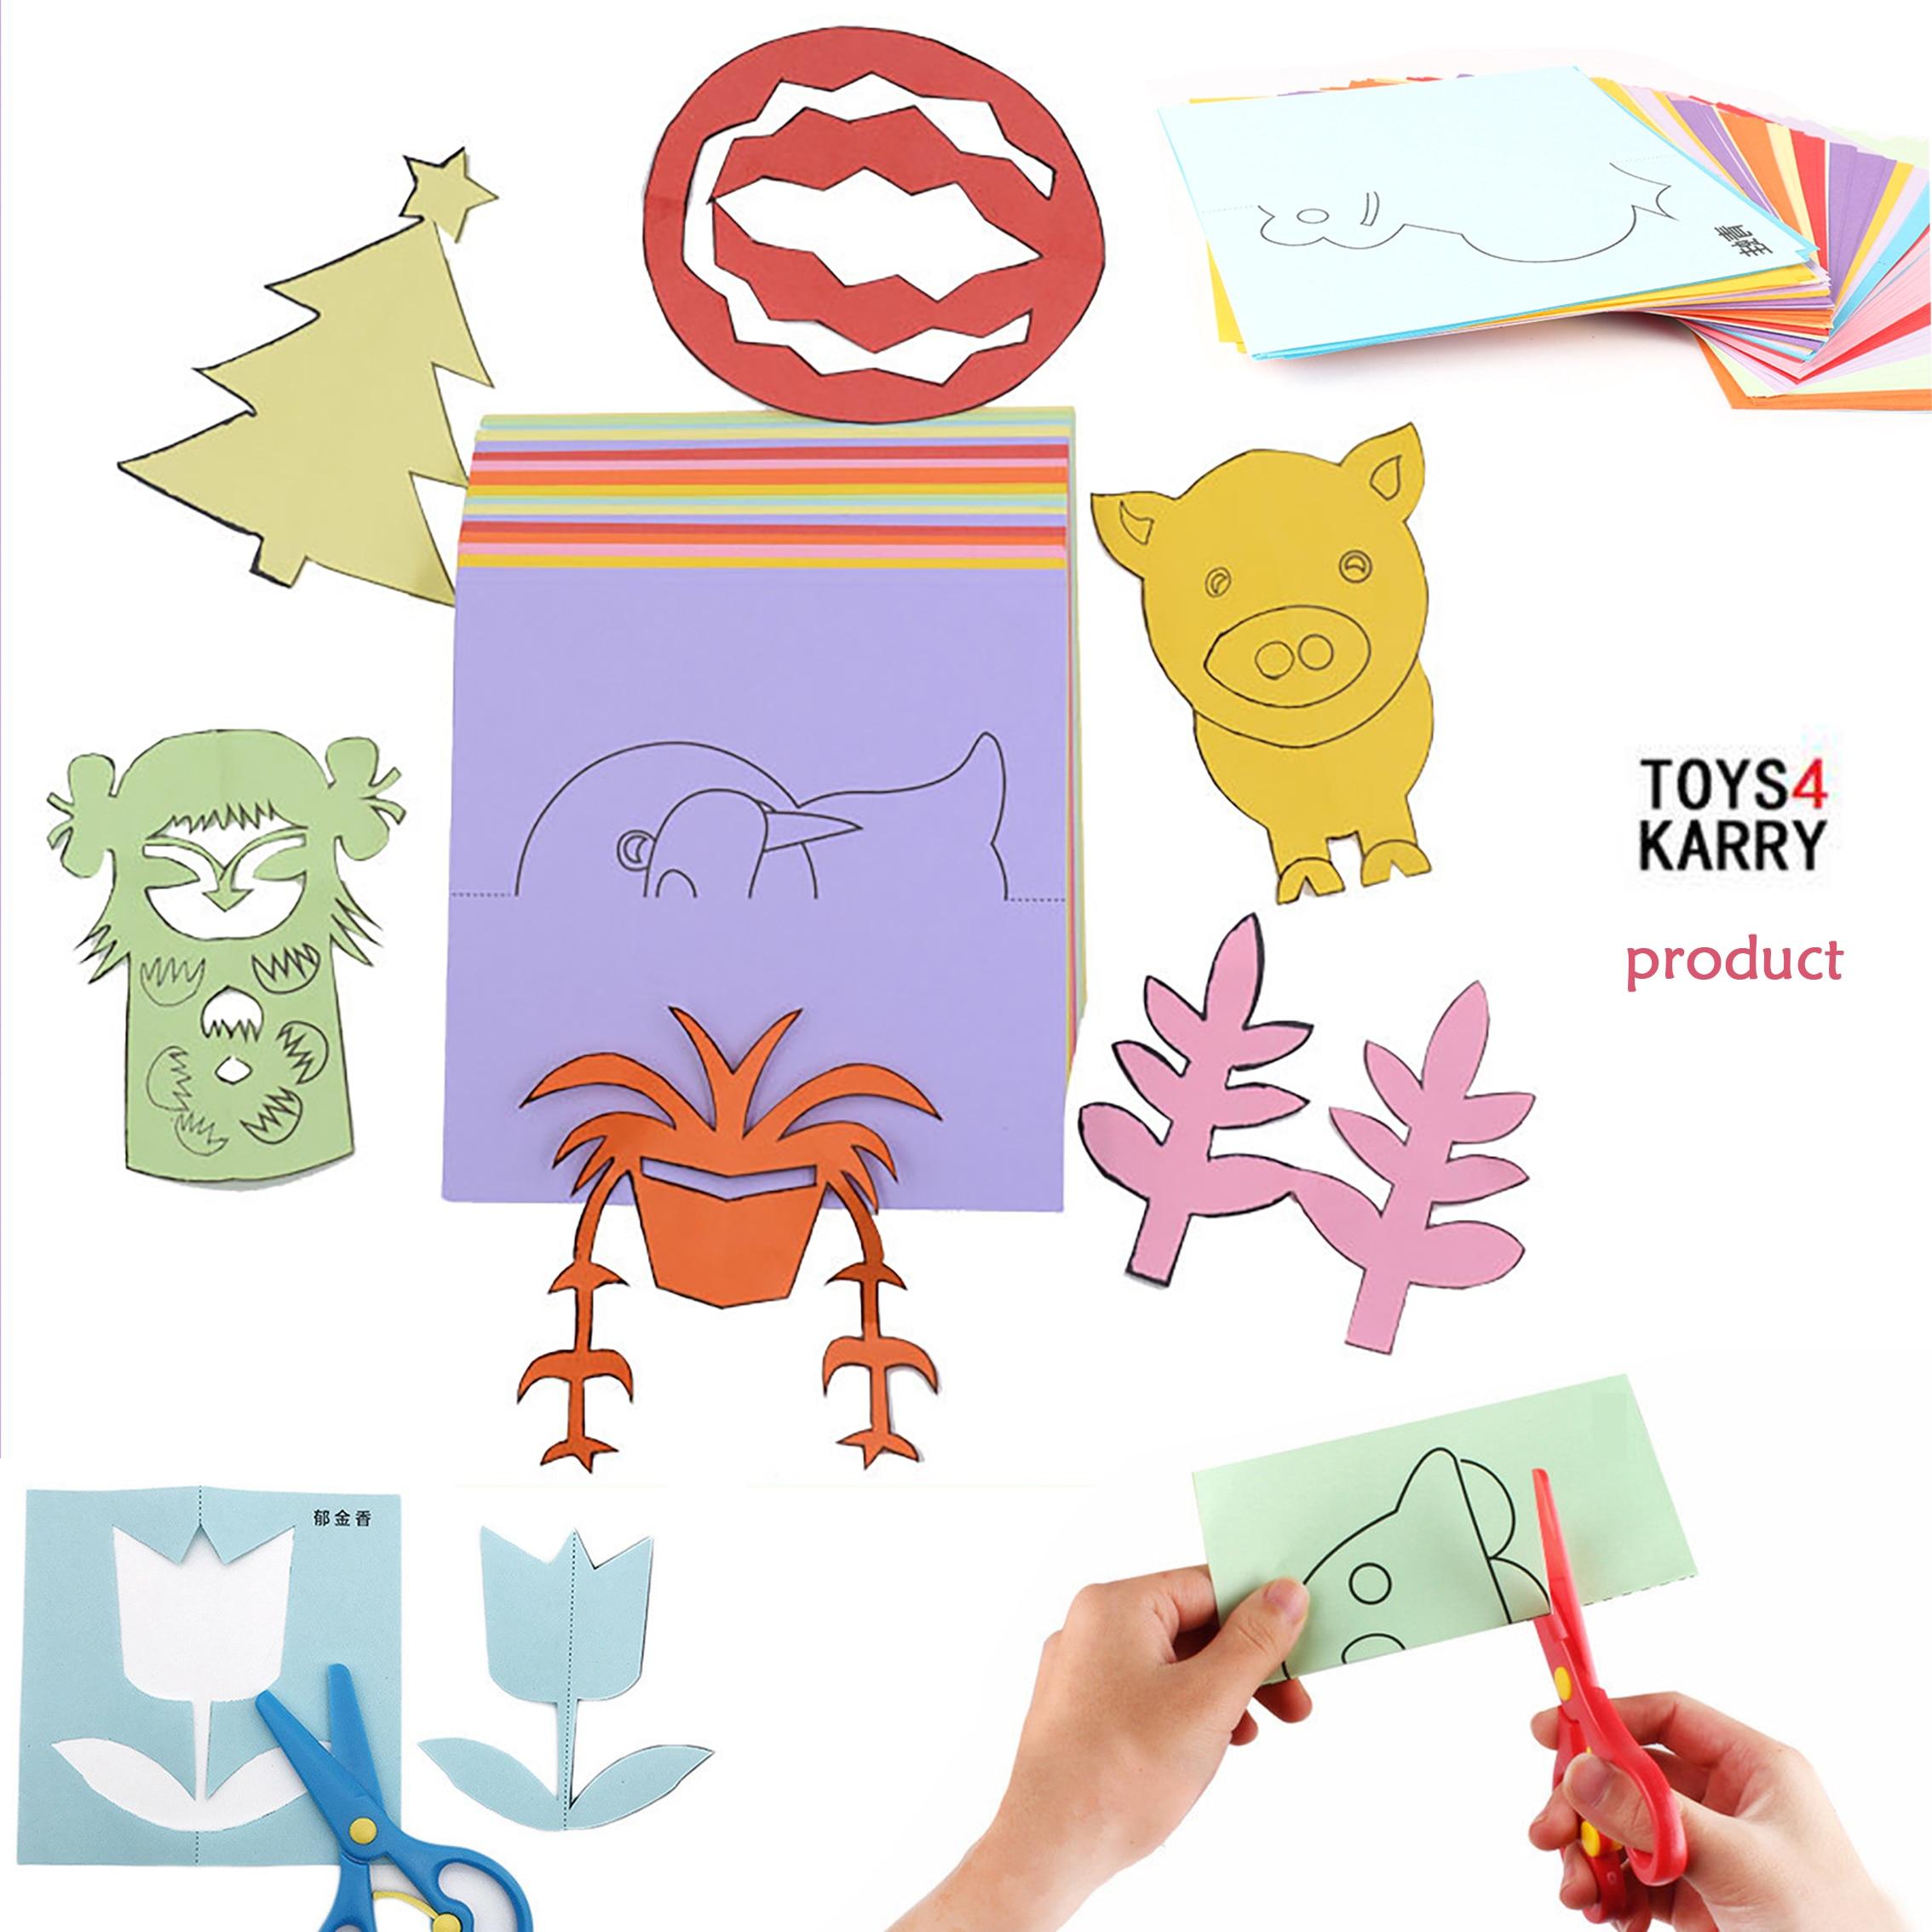 Kids Crafts Cartoon Color Paper Folding Cutting Toys For Children Kingergarden Intelligence Learning Educational DIY Art Craft